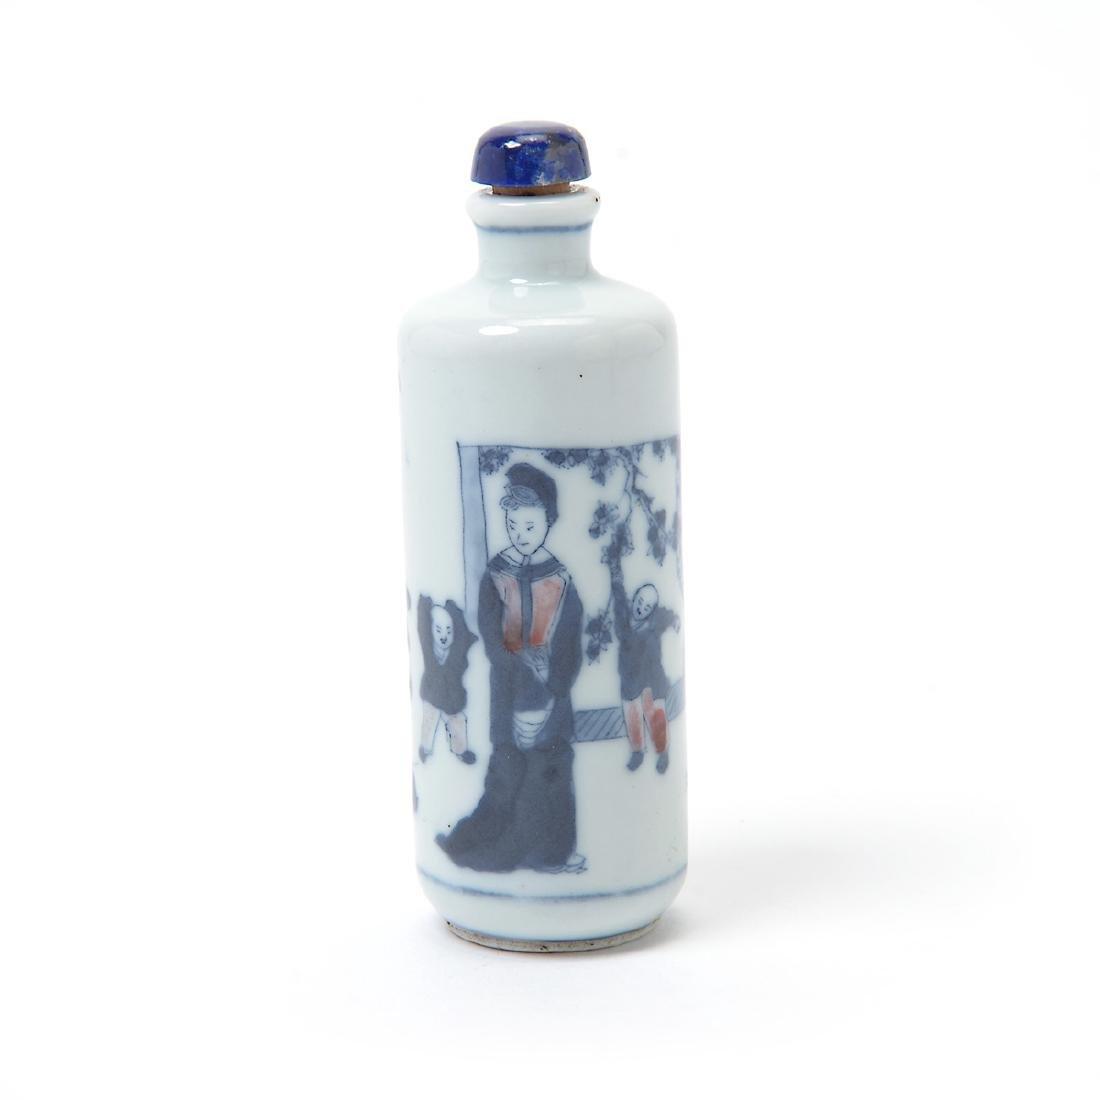 Three Underglaze Blue Porcelain Snuff Bottles, 19th C - 4